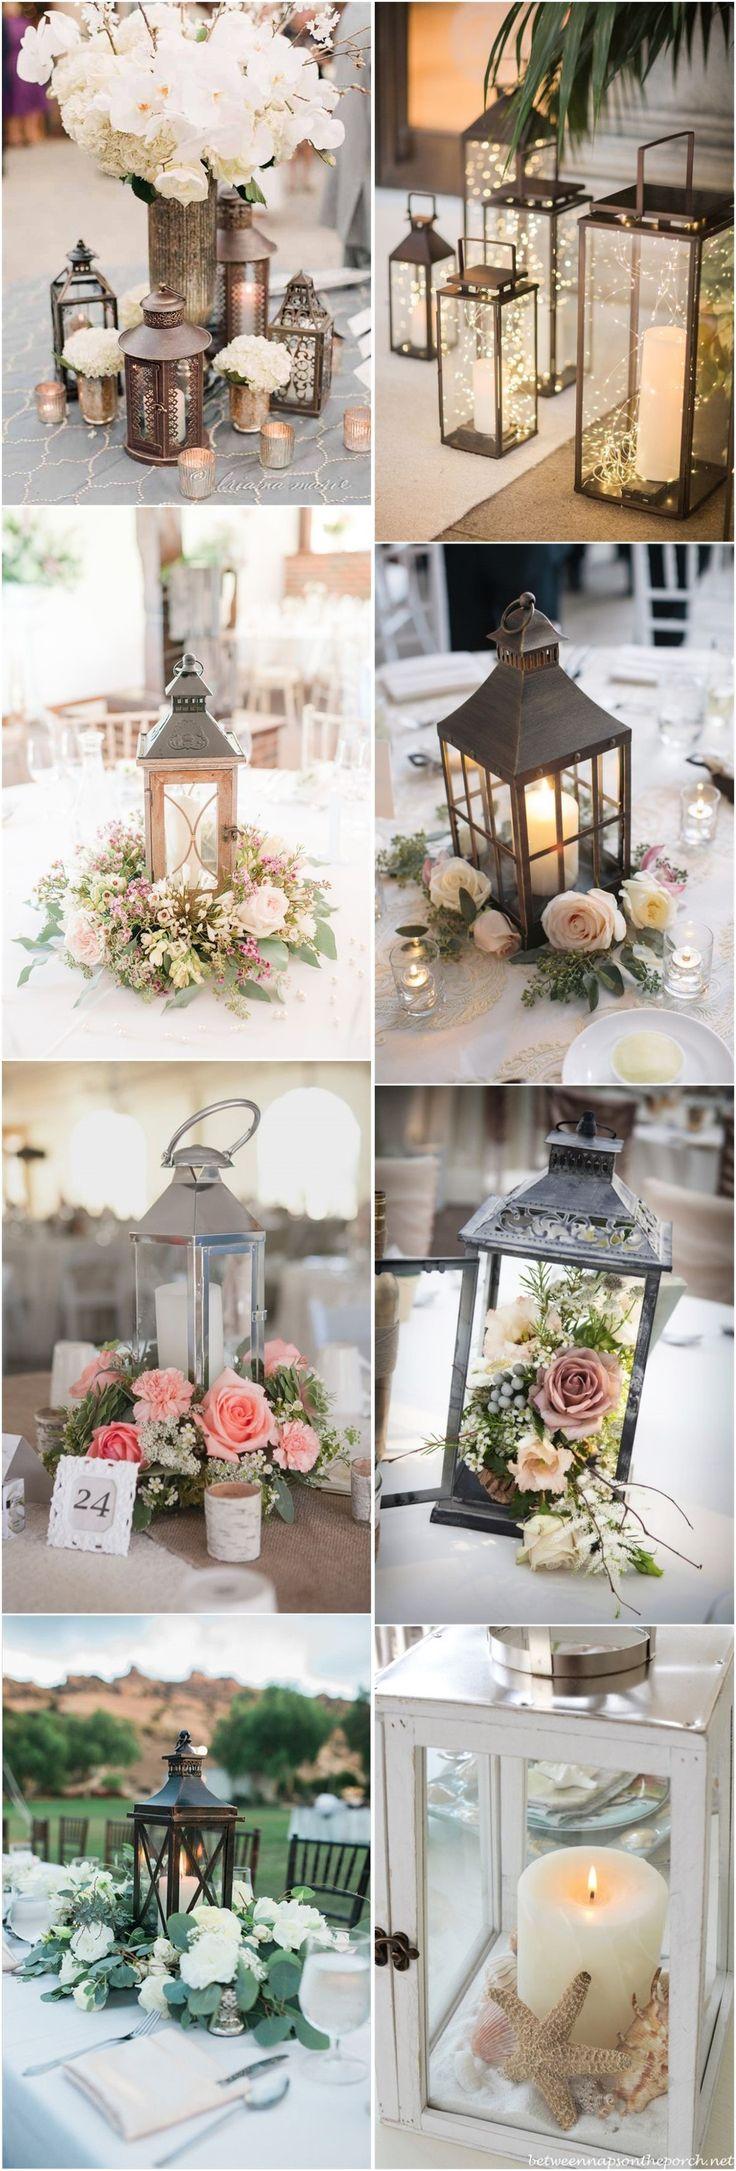 Yellow wedding decorations ideas november 2018  best wedding decor images on Pinterest  Wedding ideas Wedding